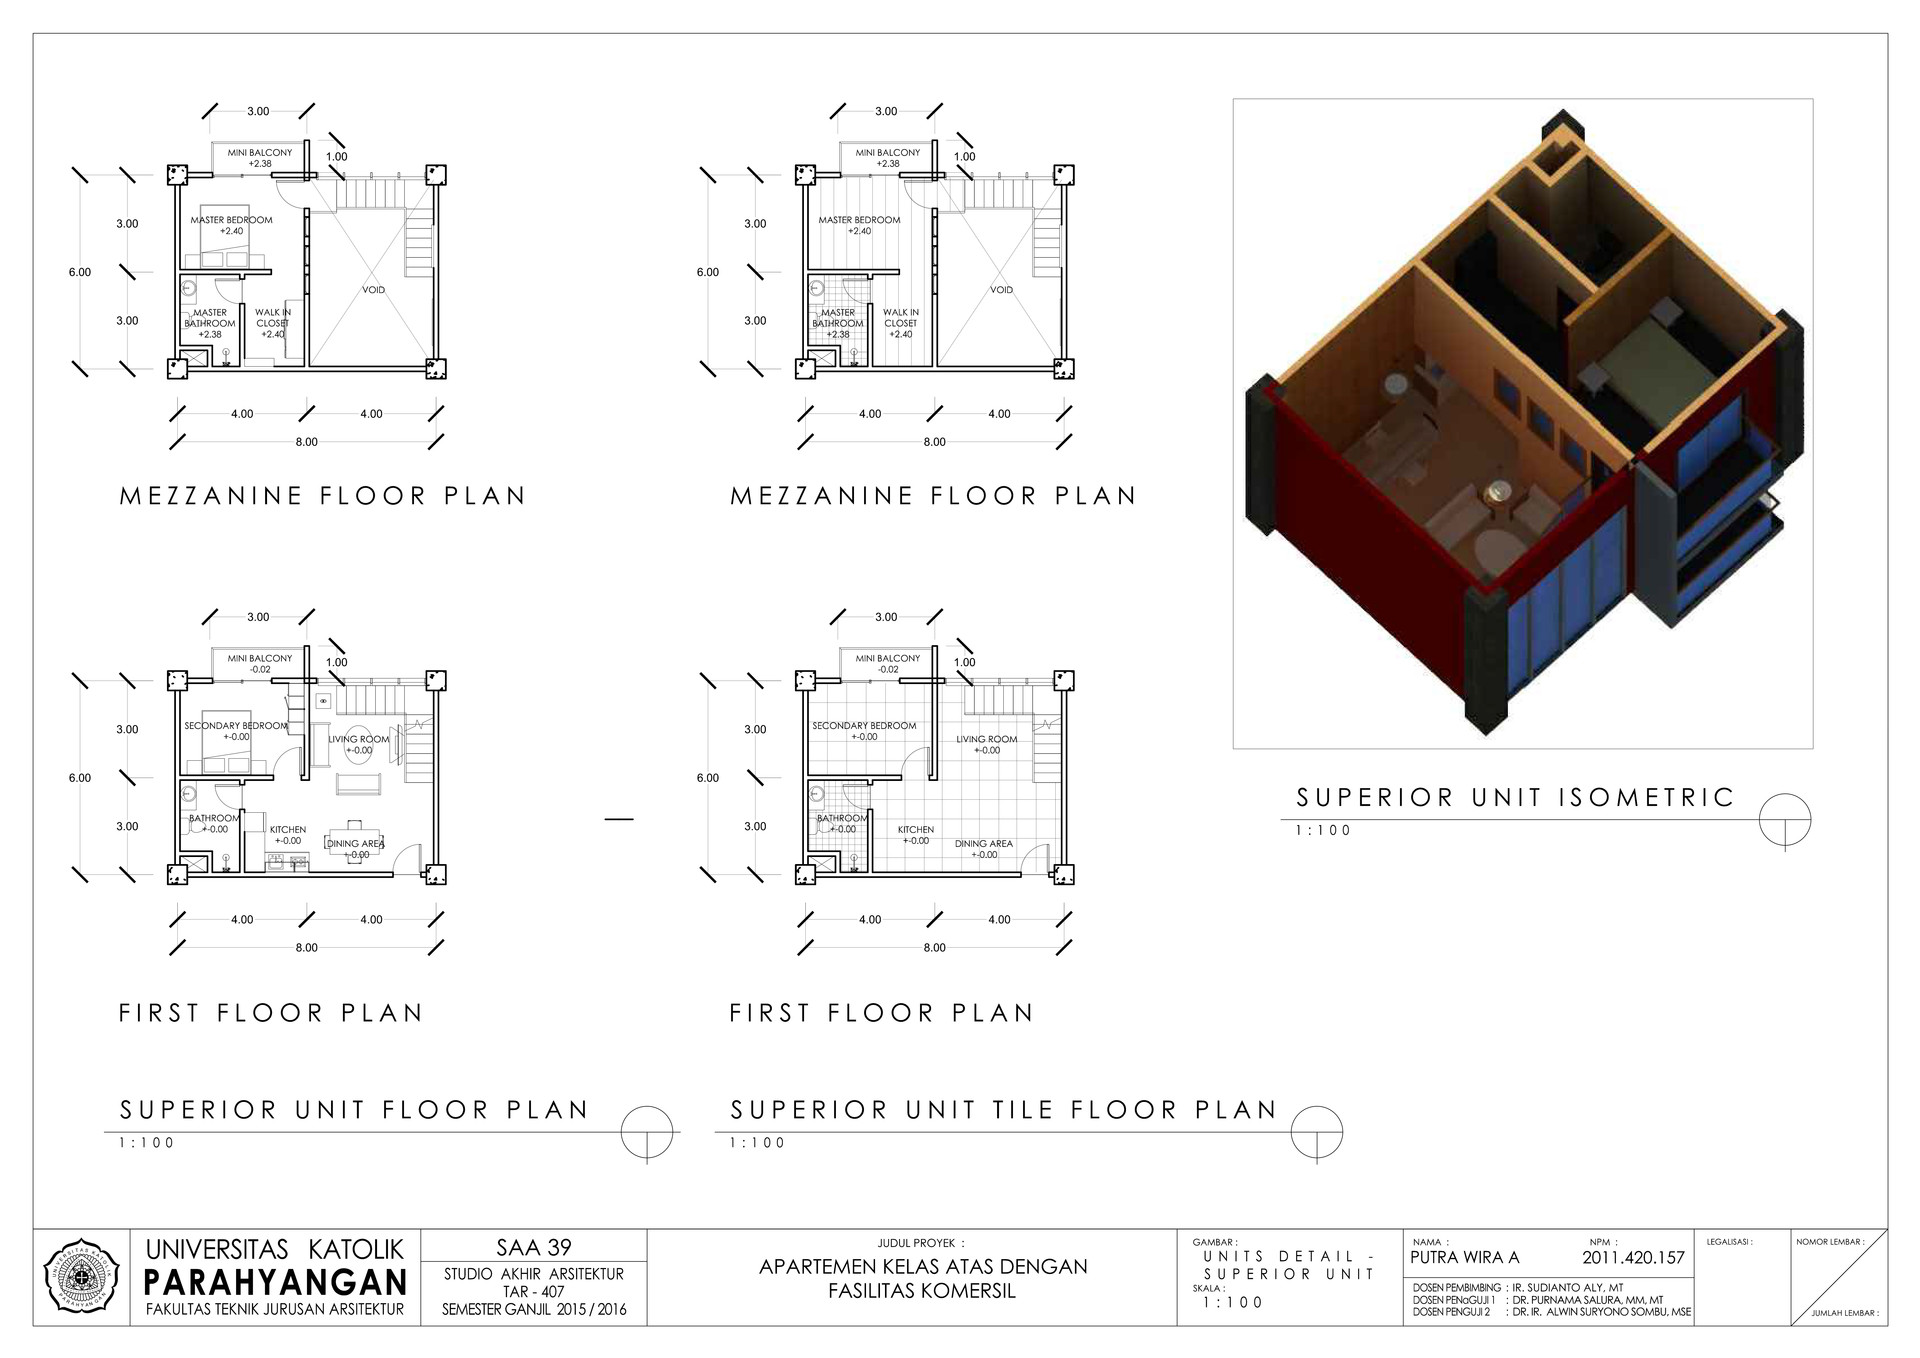 Putra wira adhiprajna 8 unit detailed superior